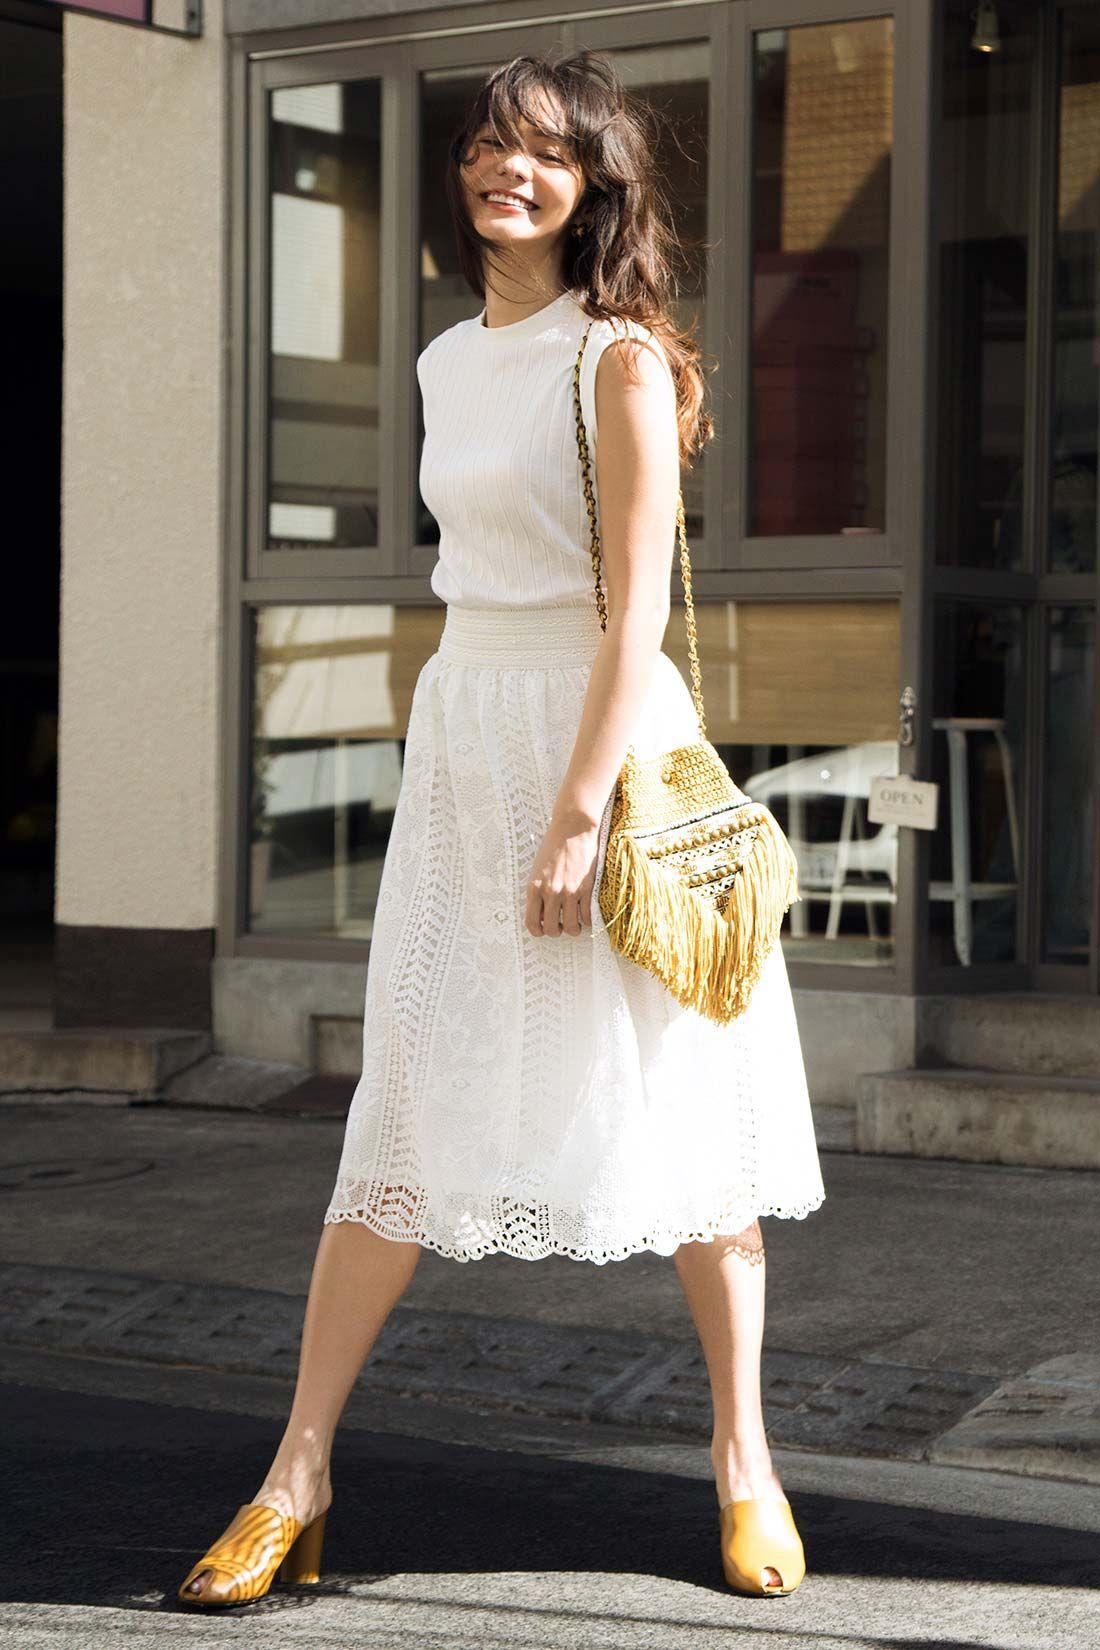 iedit summer 2017 iedit イディット フェリシモ エレガンススタイル ファッションアイデア 白レーススカート